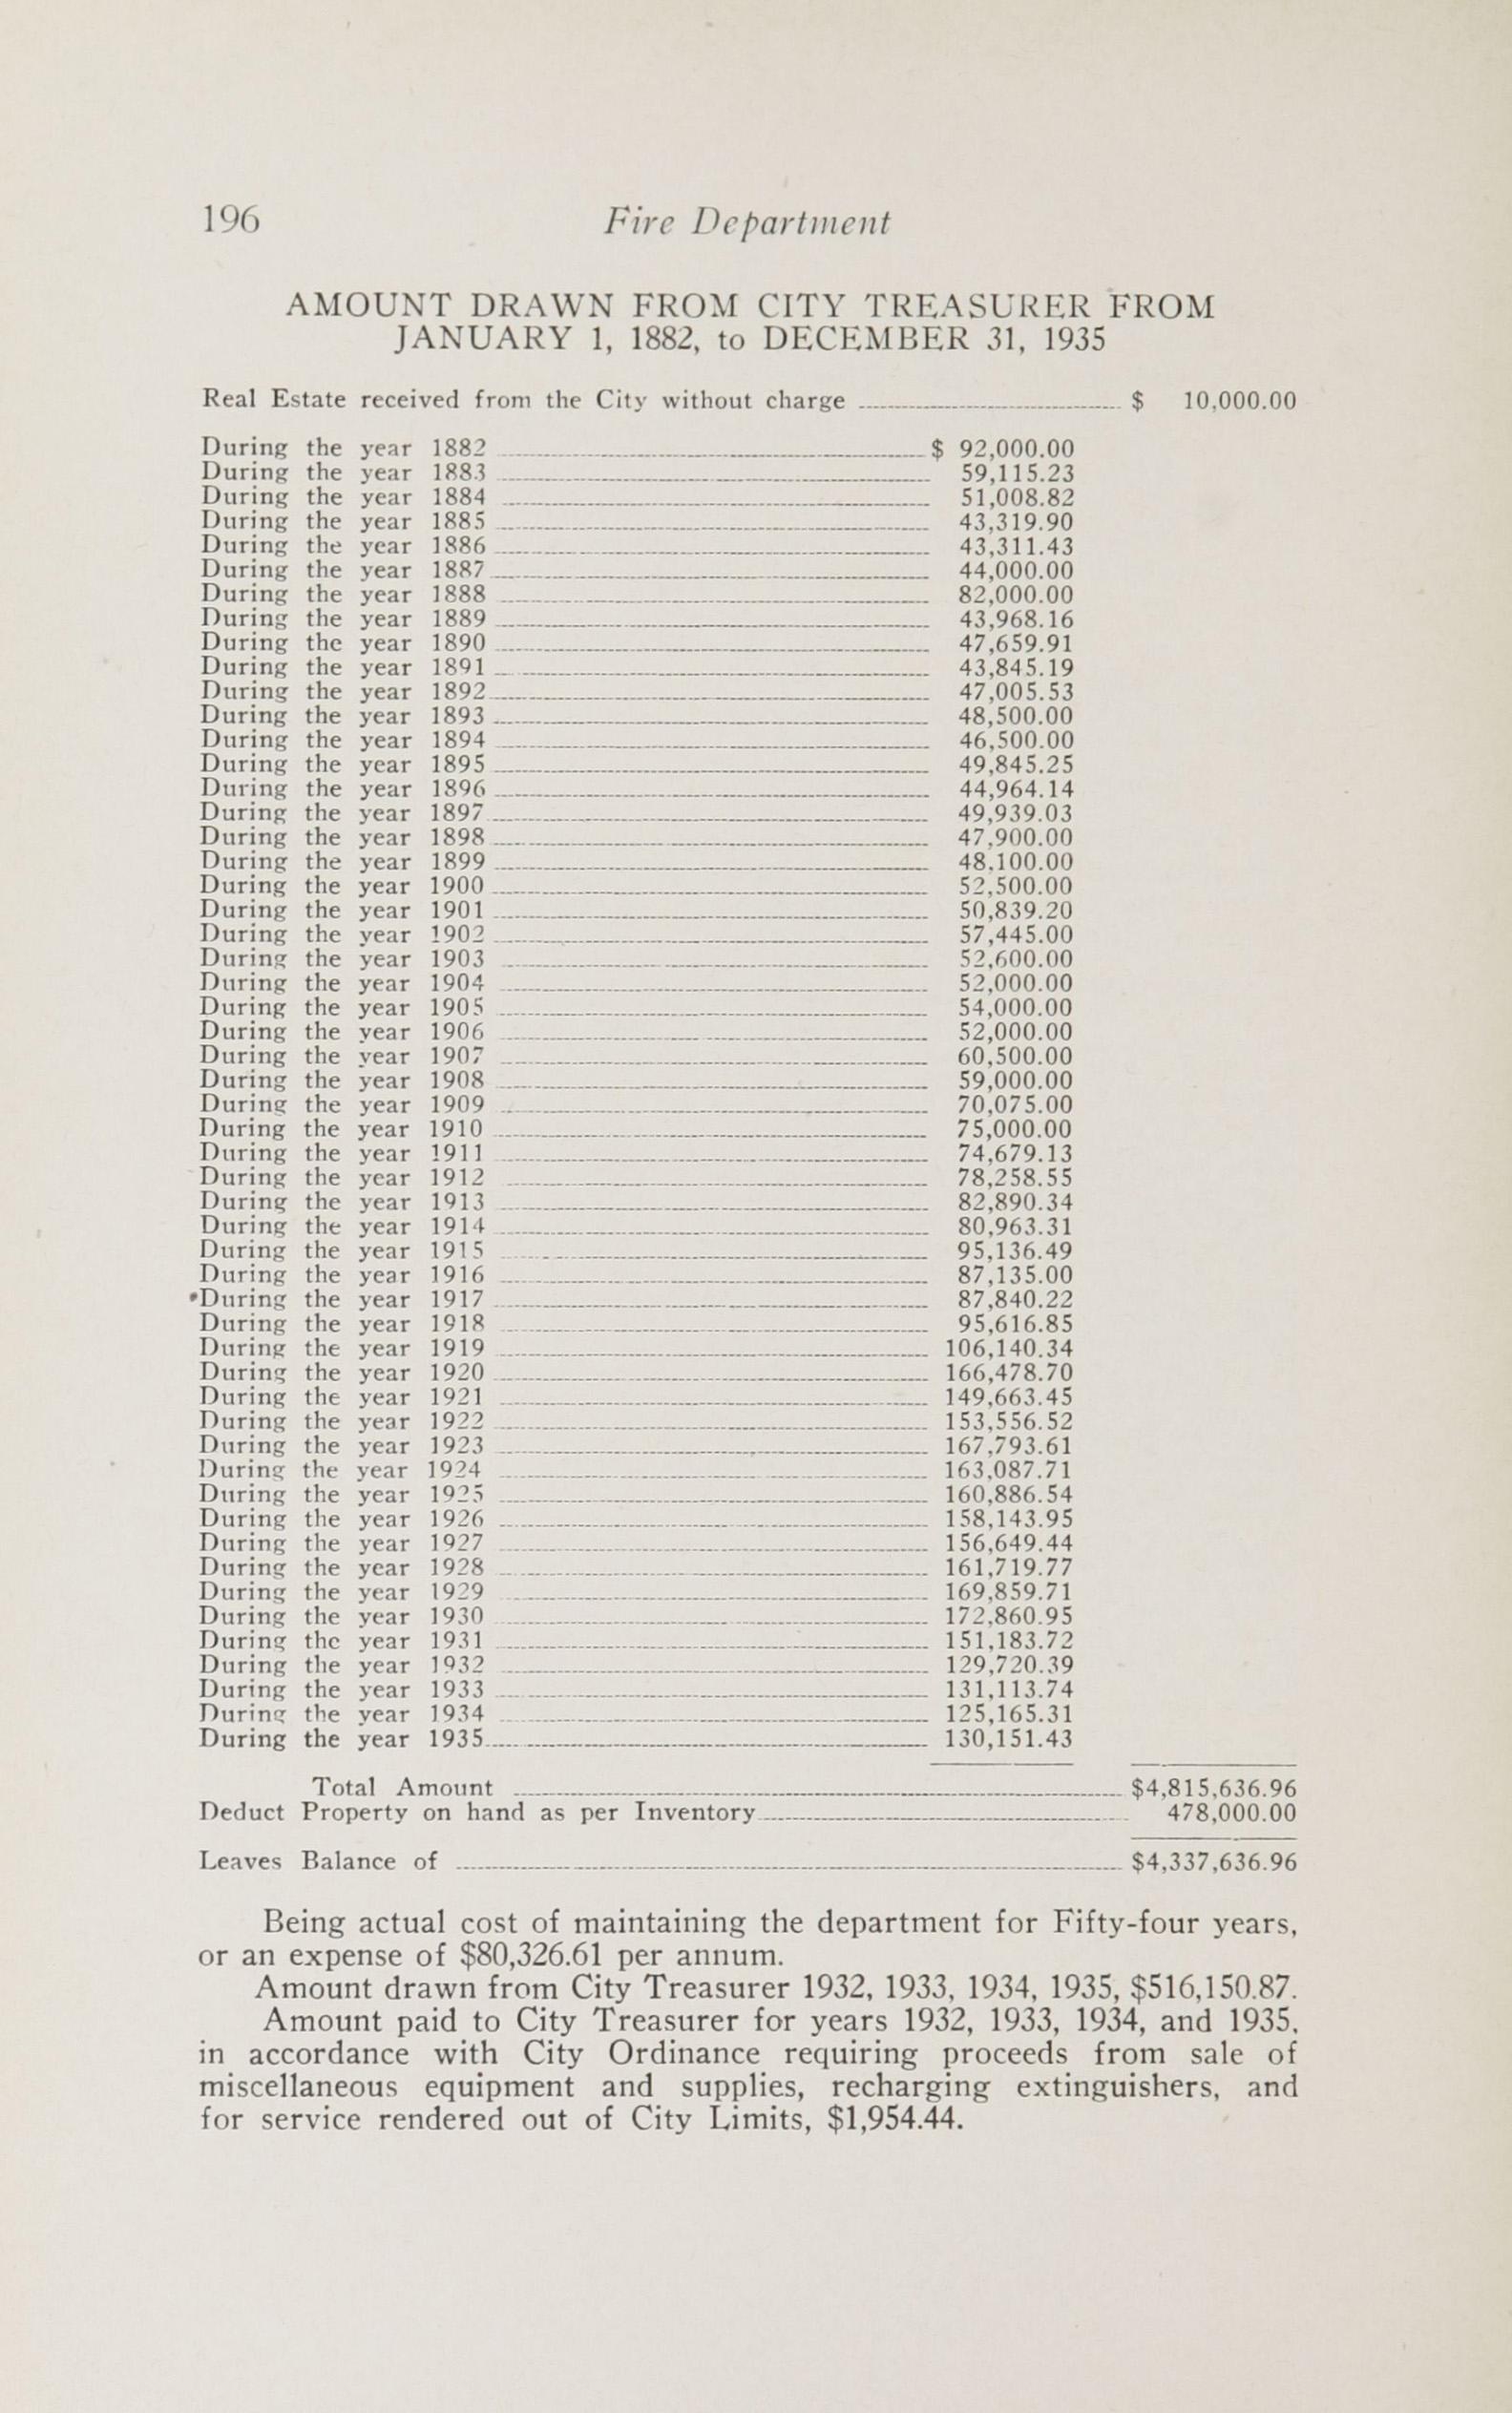 Charleston Yearbook, 1932-1935, page 196